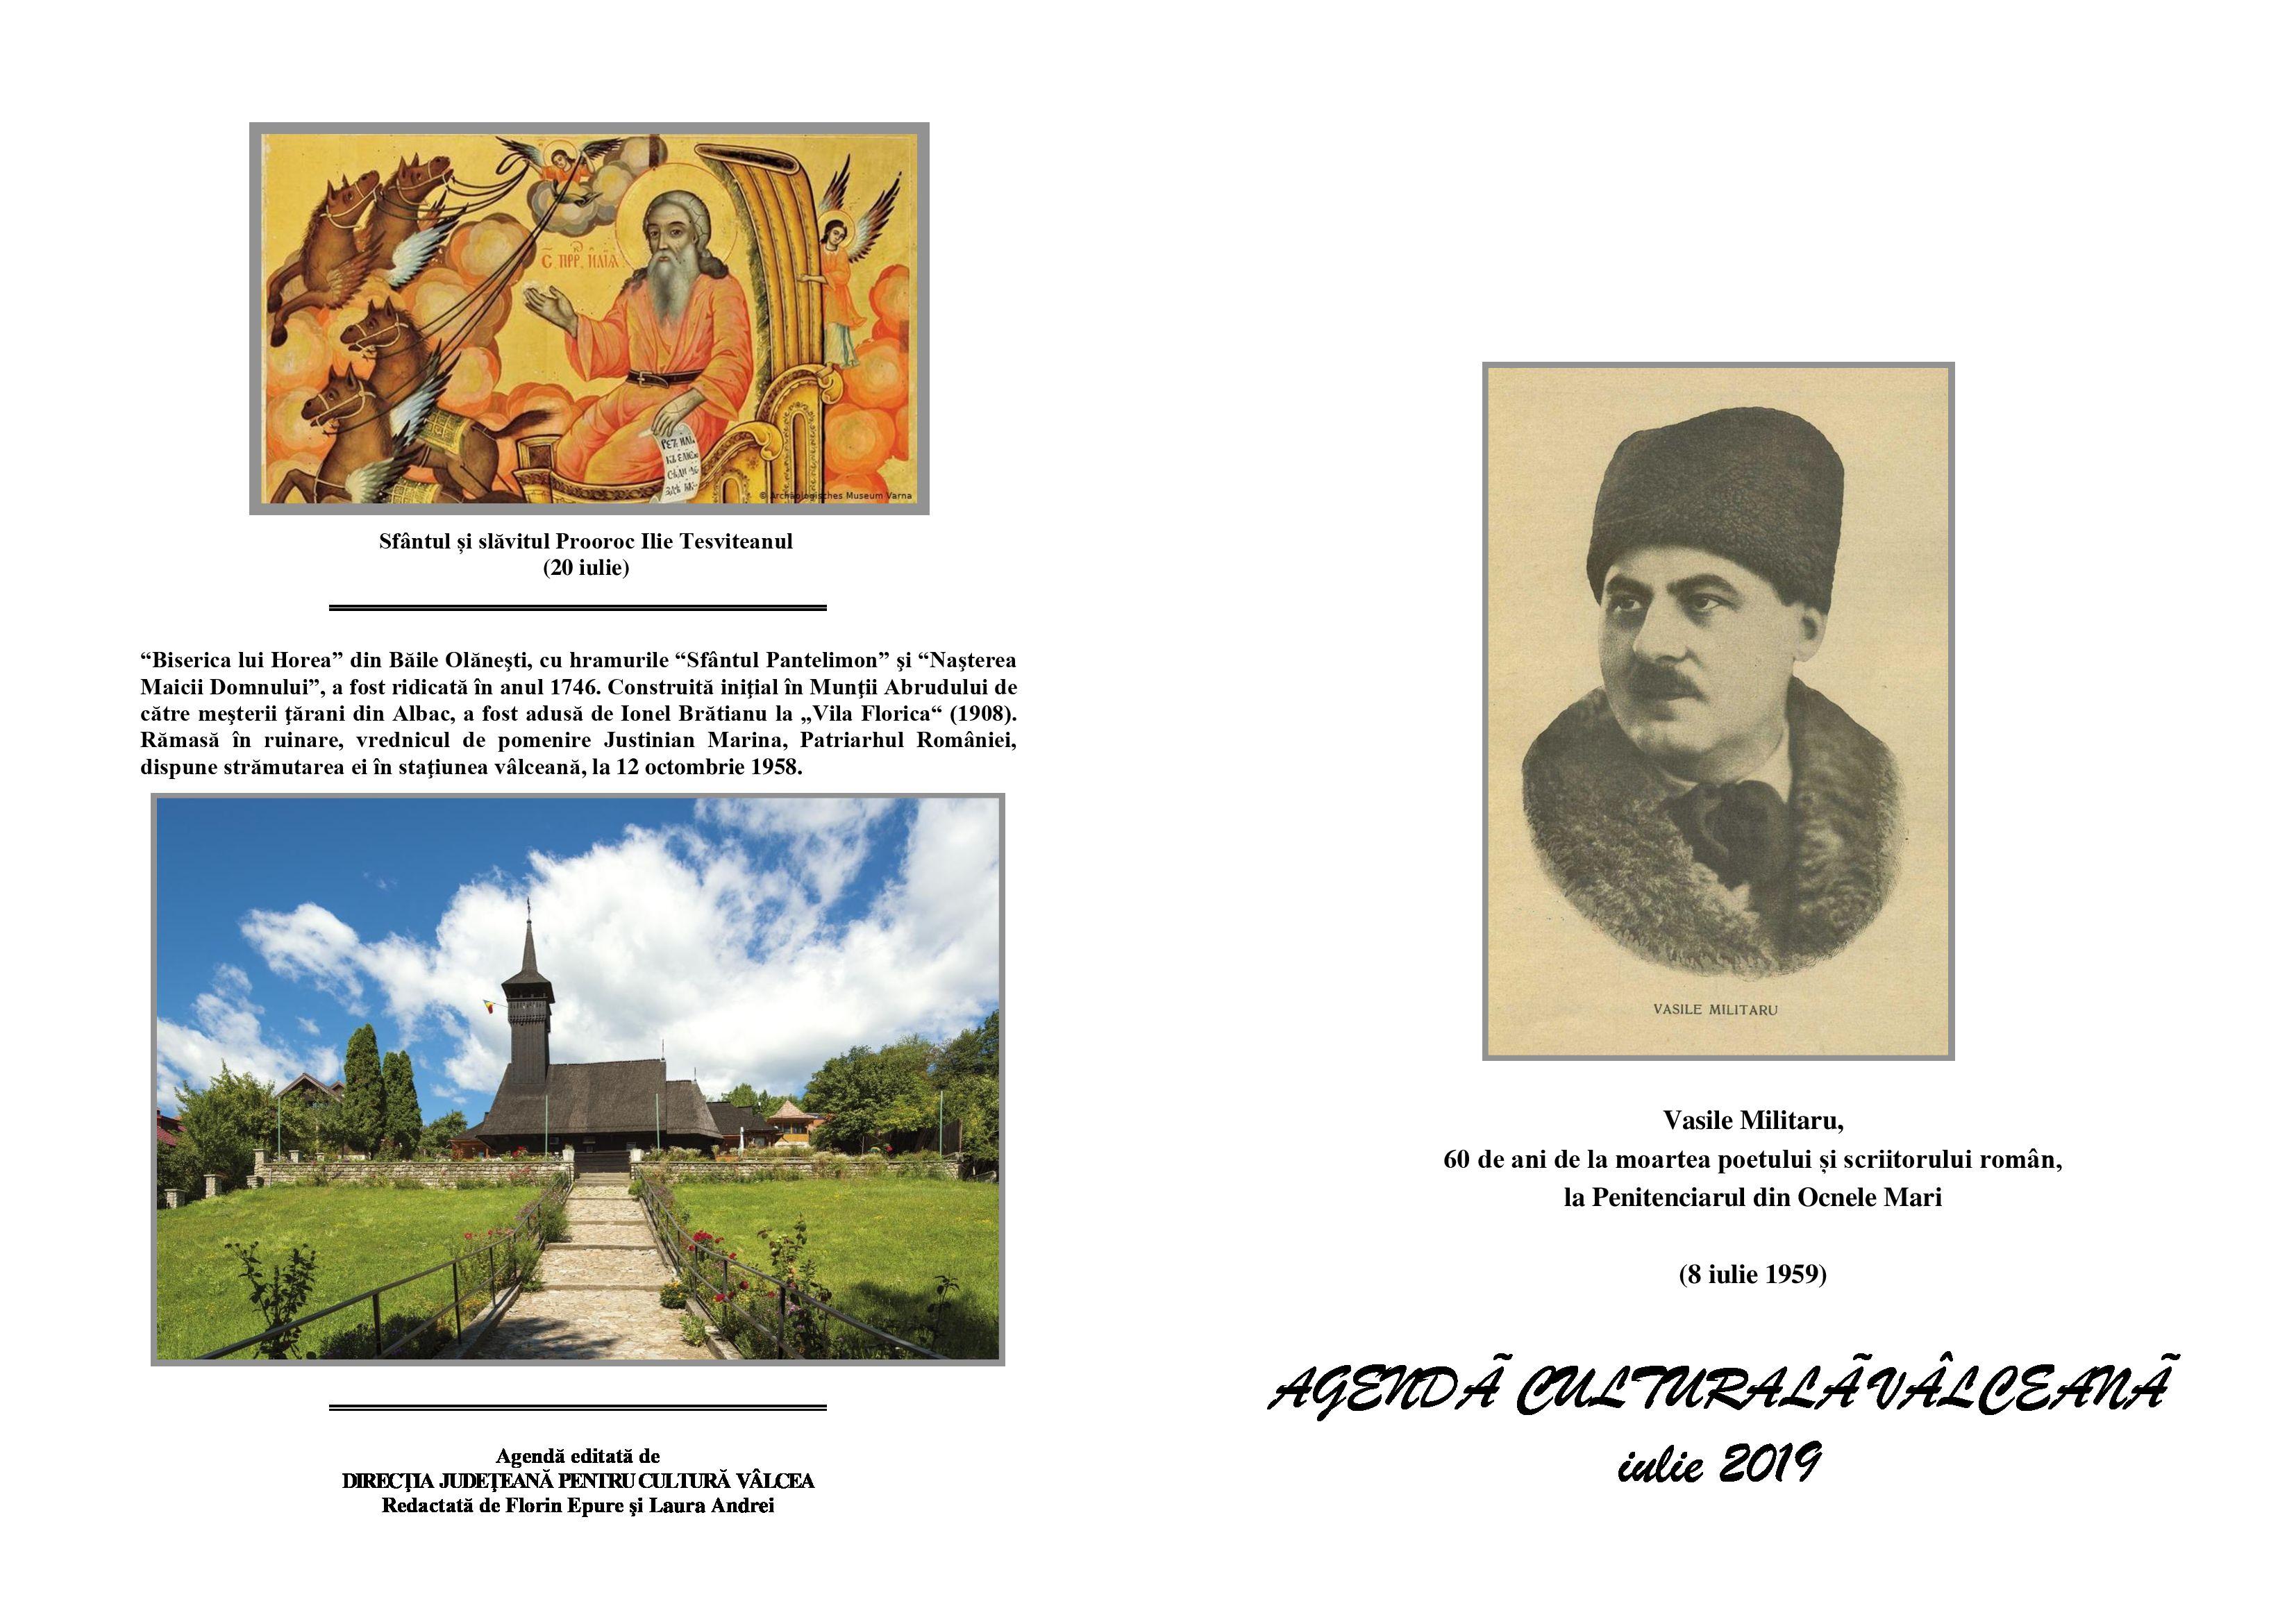 Agenda Culturala Valceana, iul 2019